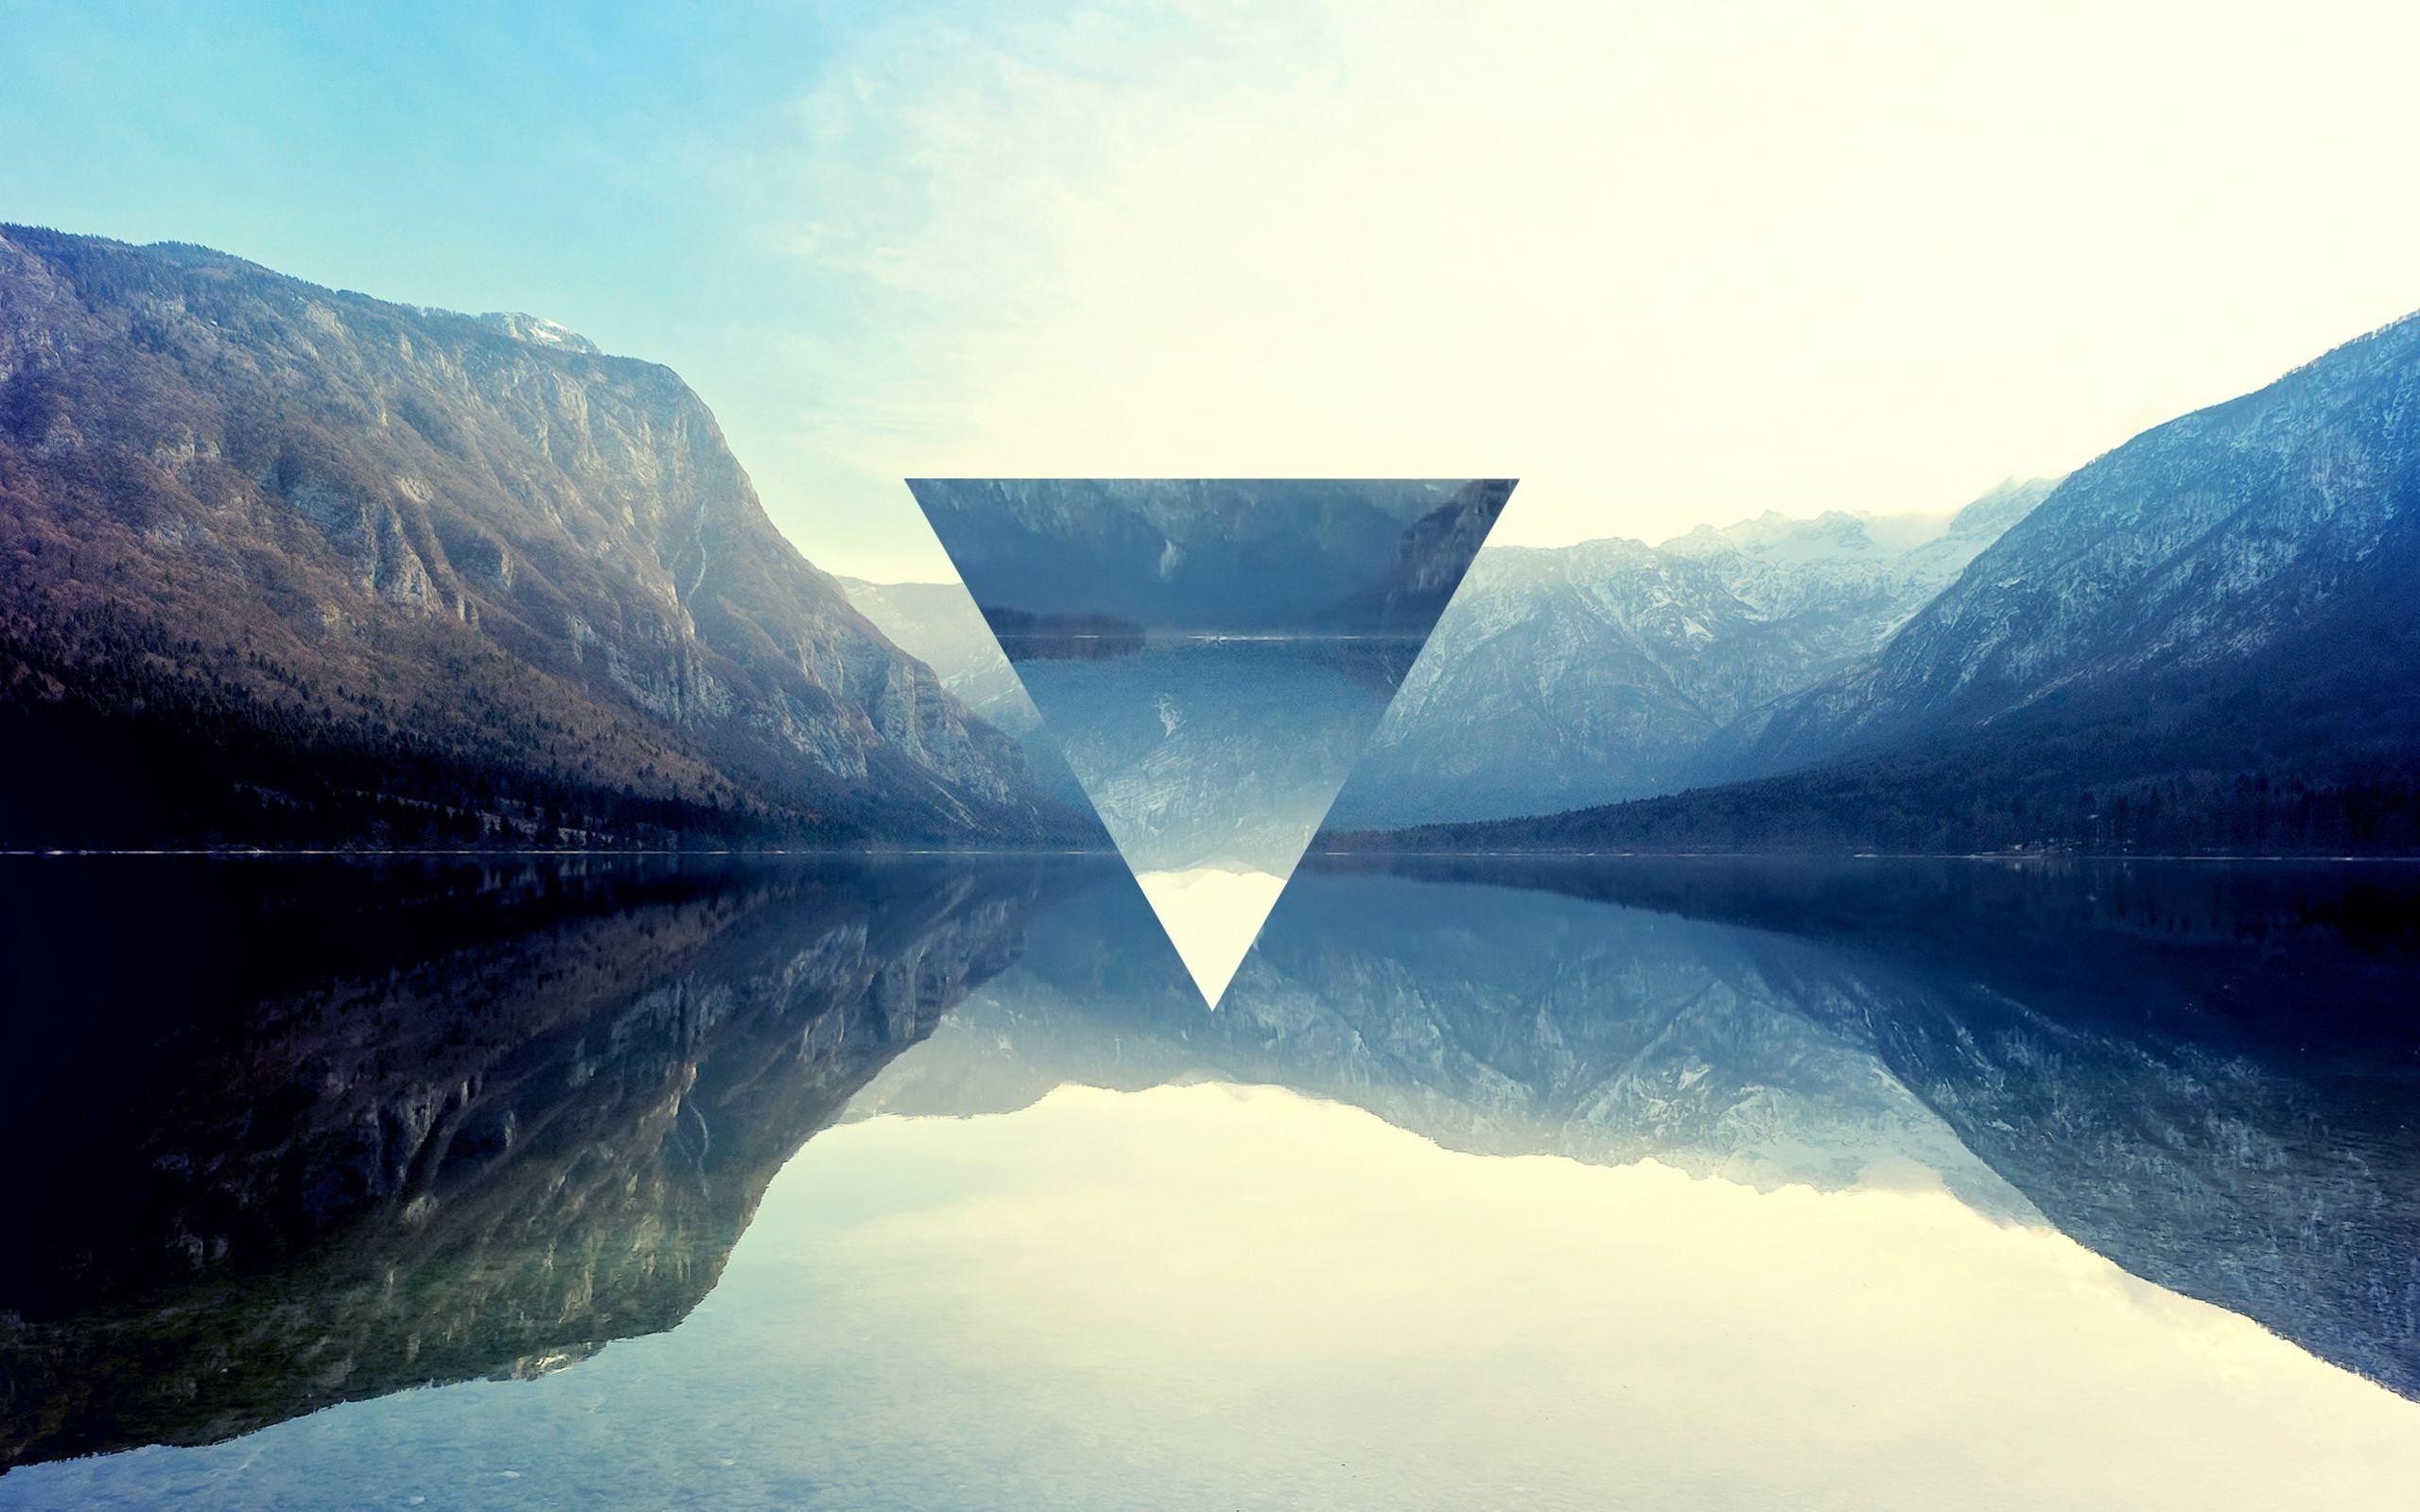 Beautiful Wallpaper Mountain Triangle - 2559x1599-px-lake-mountain-polyscape-reflection-triangle-652300  2018_40853.jpg